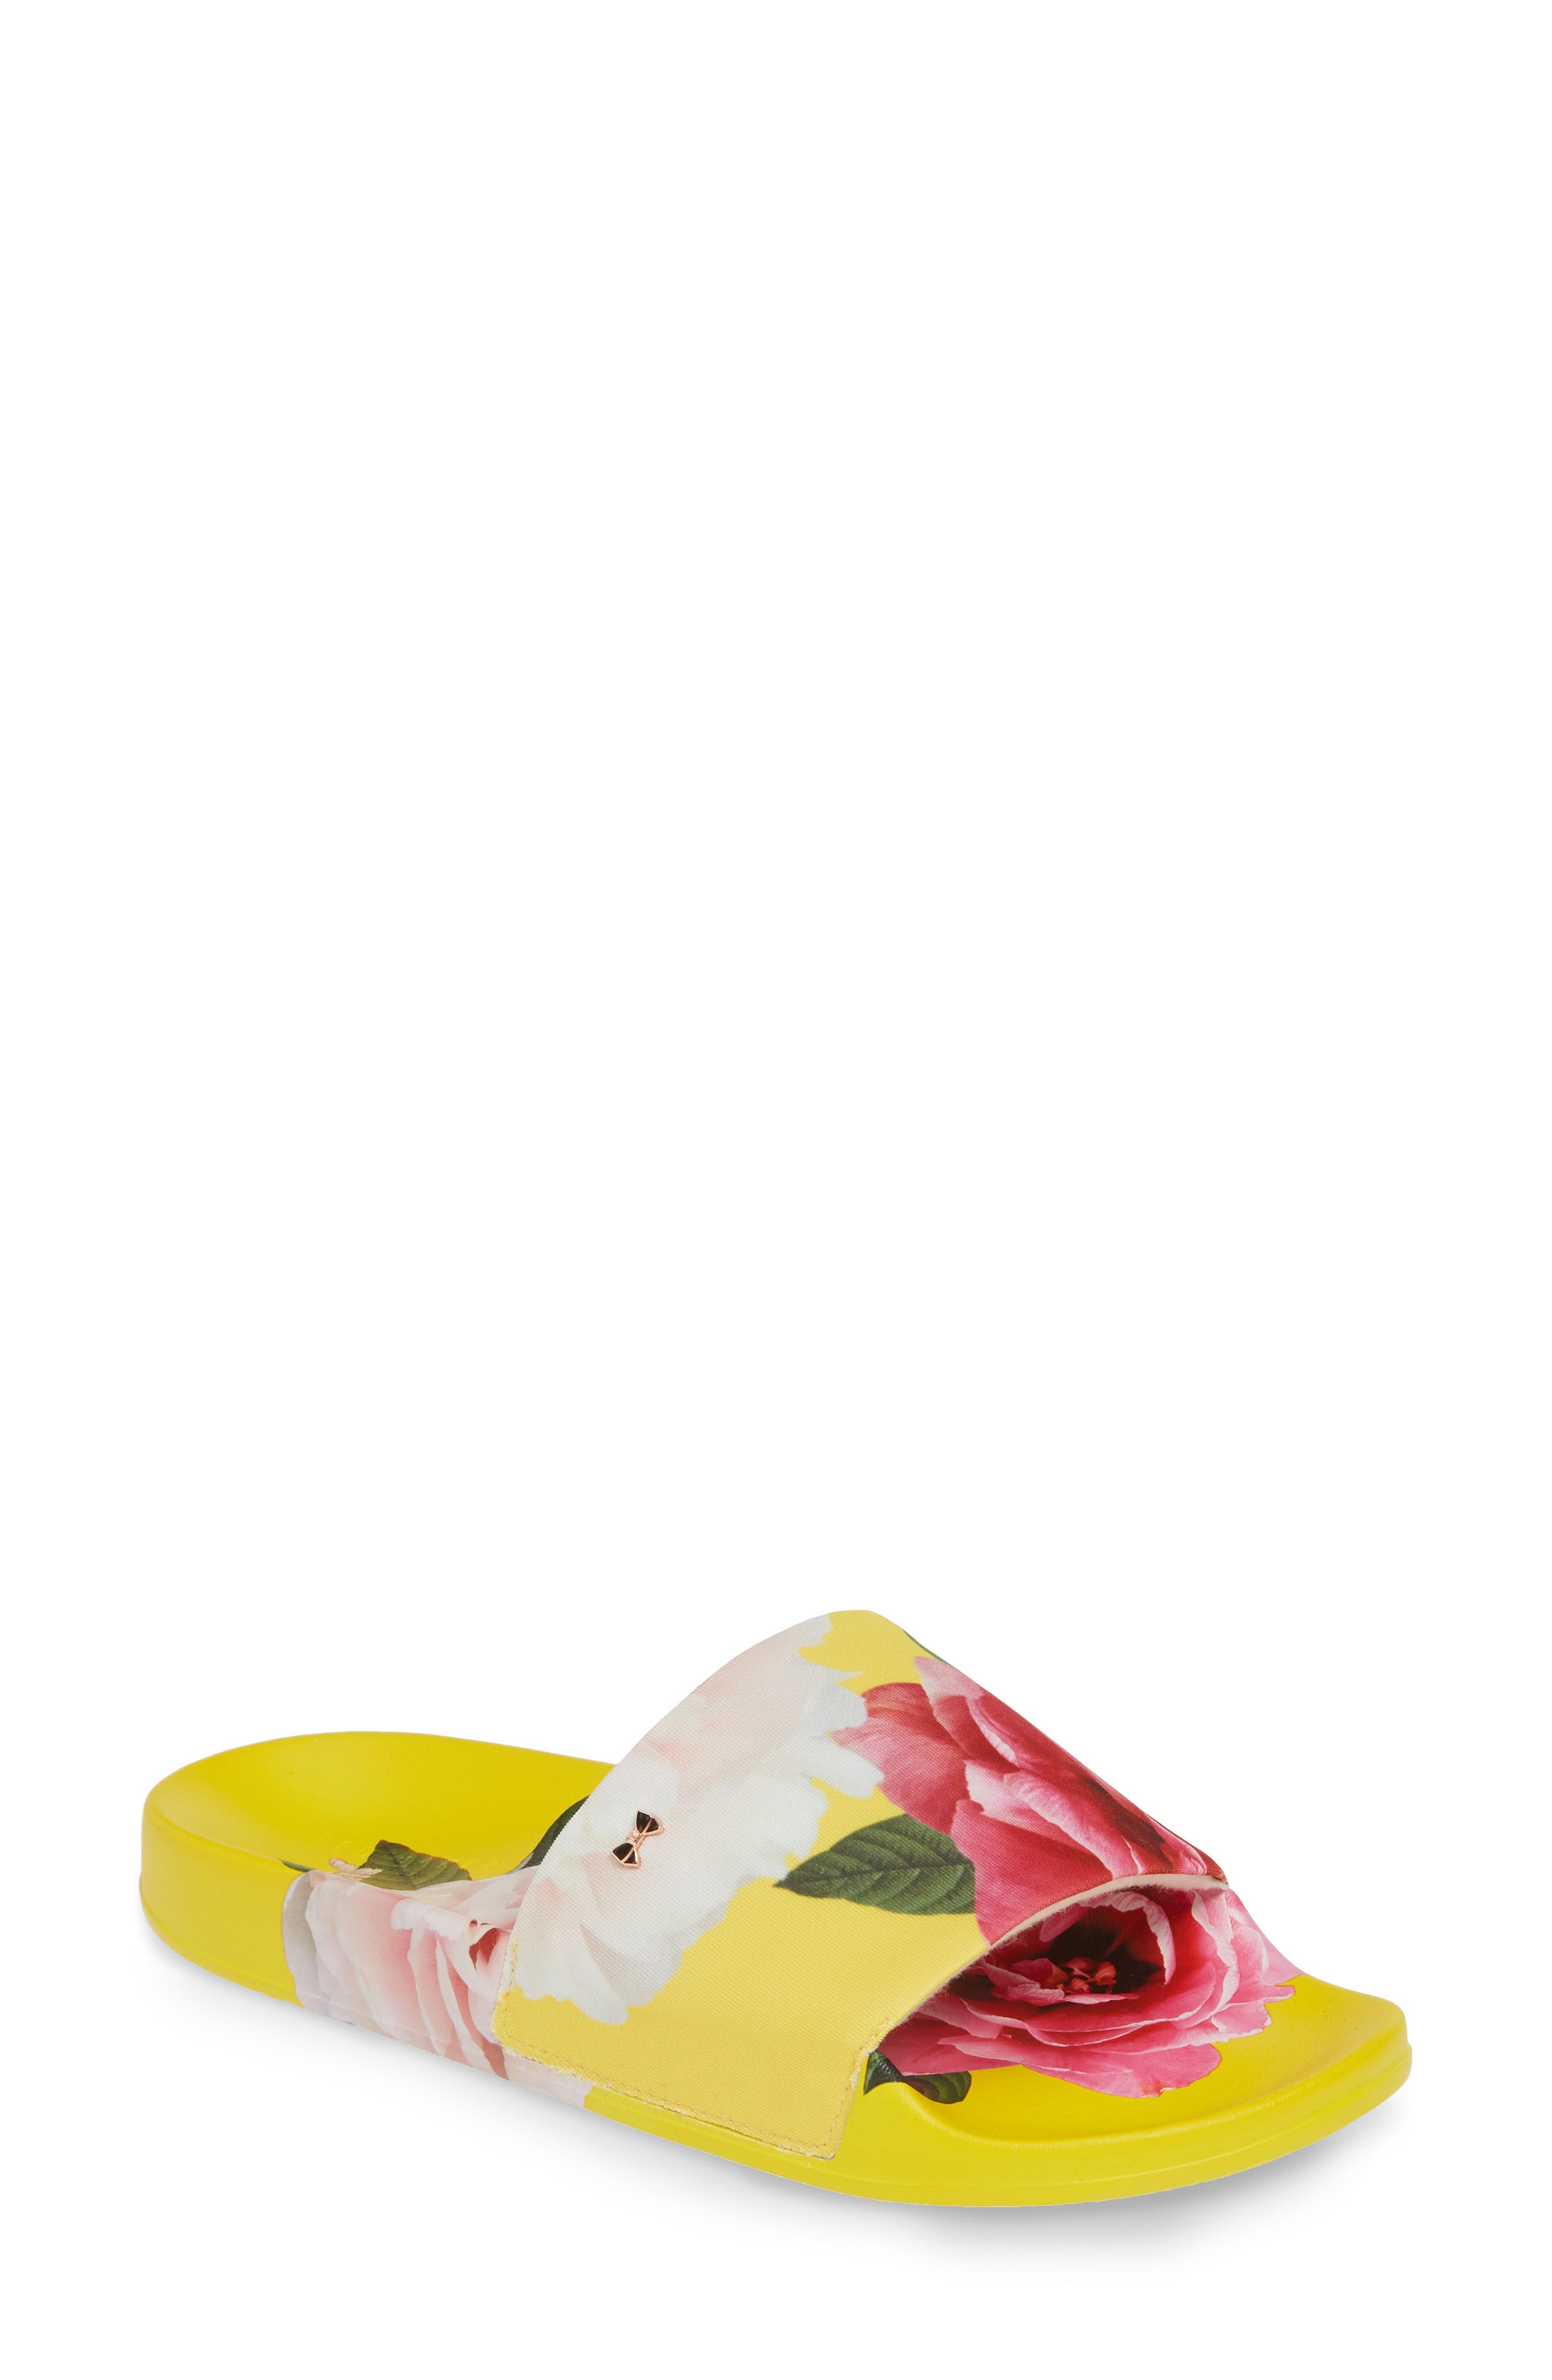 Avelini Slide Sandal, Main, color, MAGNIFICENT YELLOW SATIN